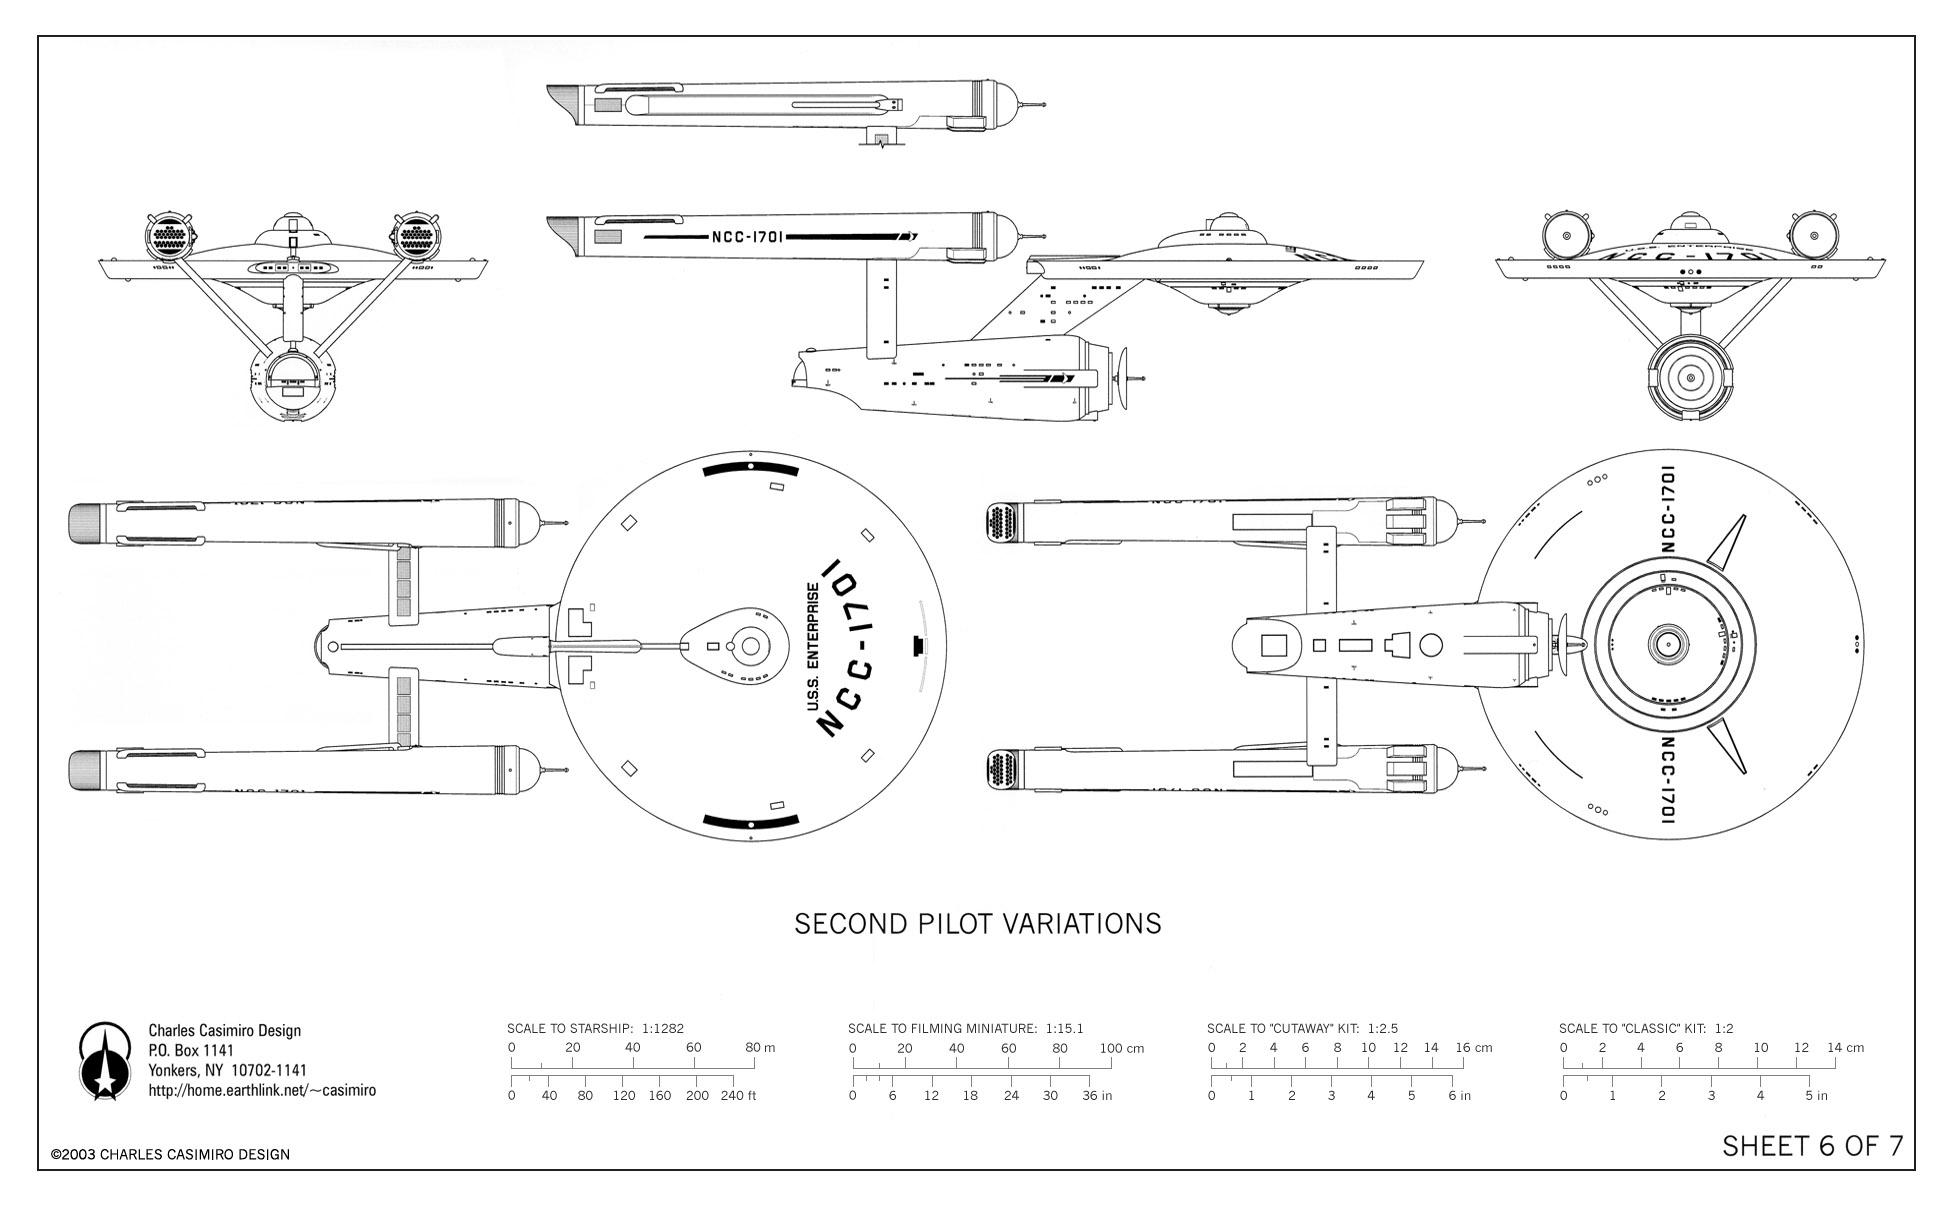 uss enterprise diagram 3 wire stop start wiring u s ncc 1701 blueprints by charles casimiro design